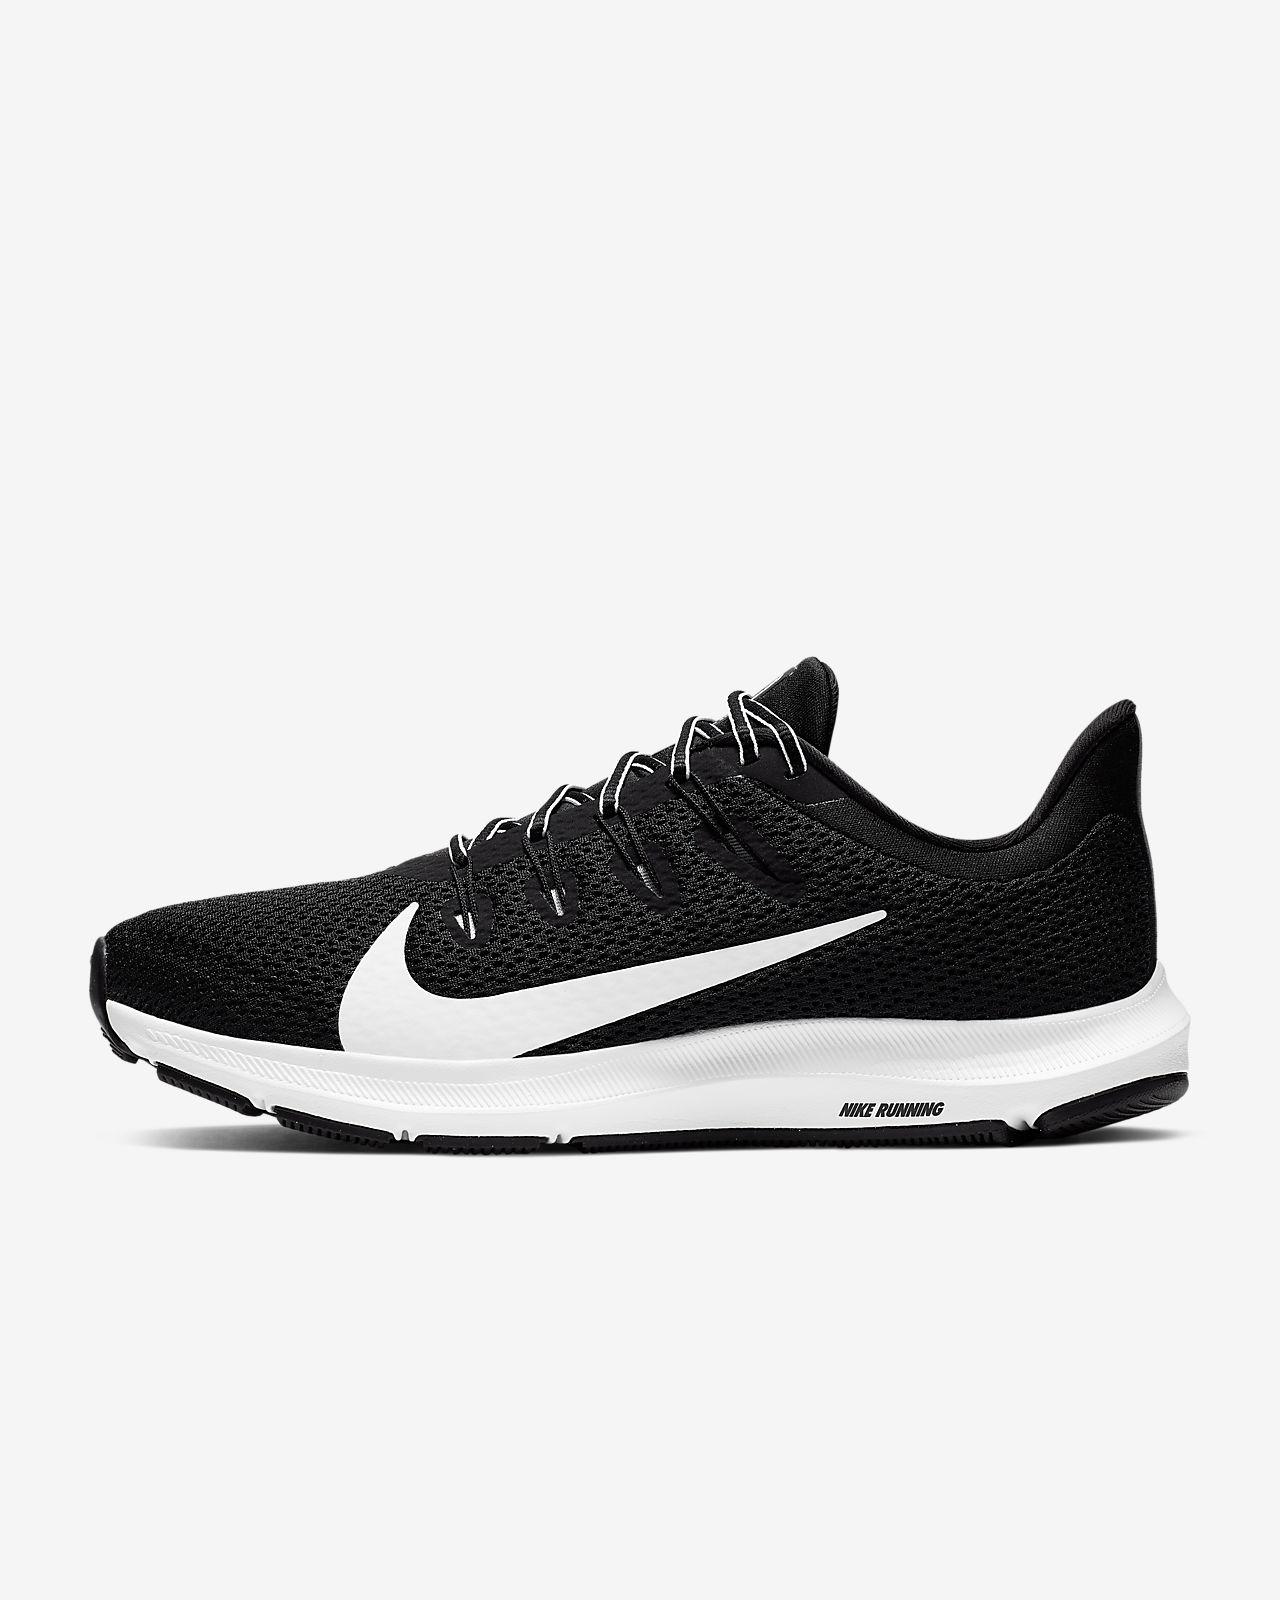 Nike QUEST 2 fekete 10 Férfi futócipő | Sportmarkt